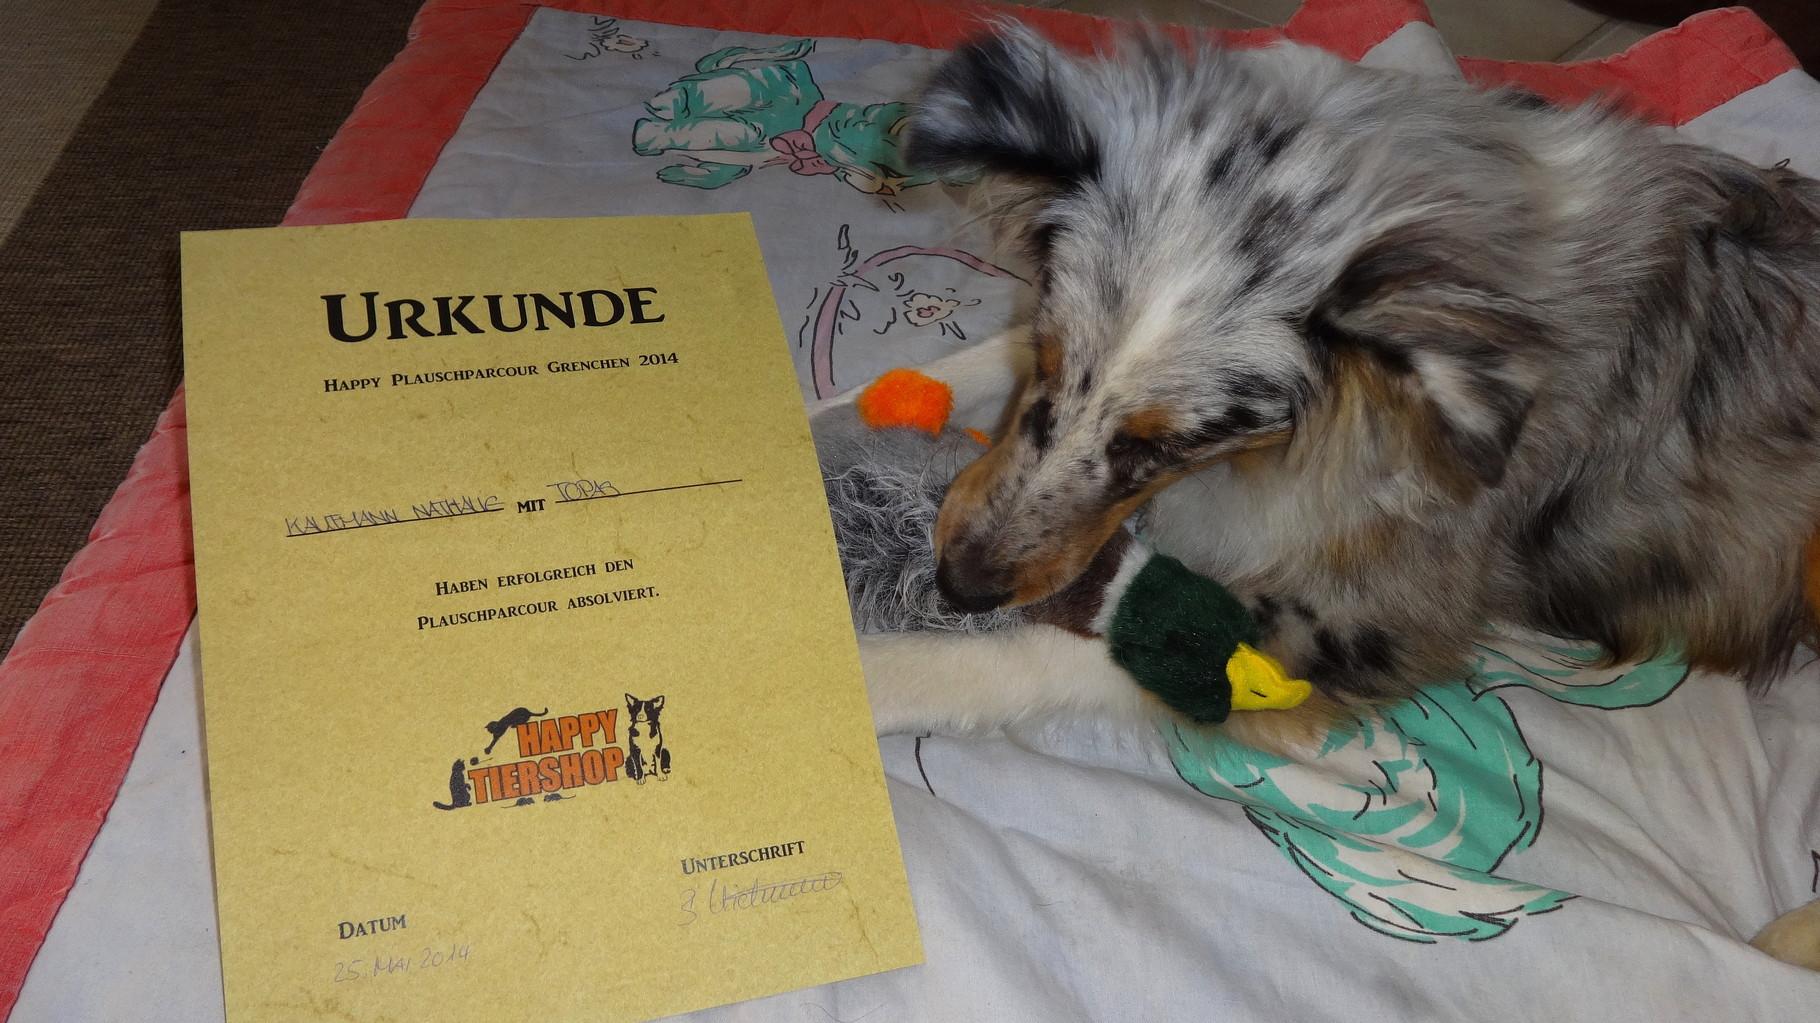 Erster Plauschparcours für Topas, Ente gewonnen!